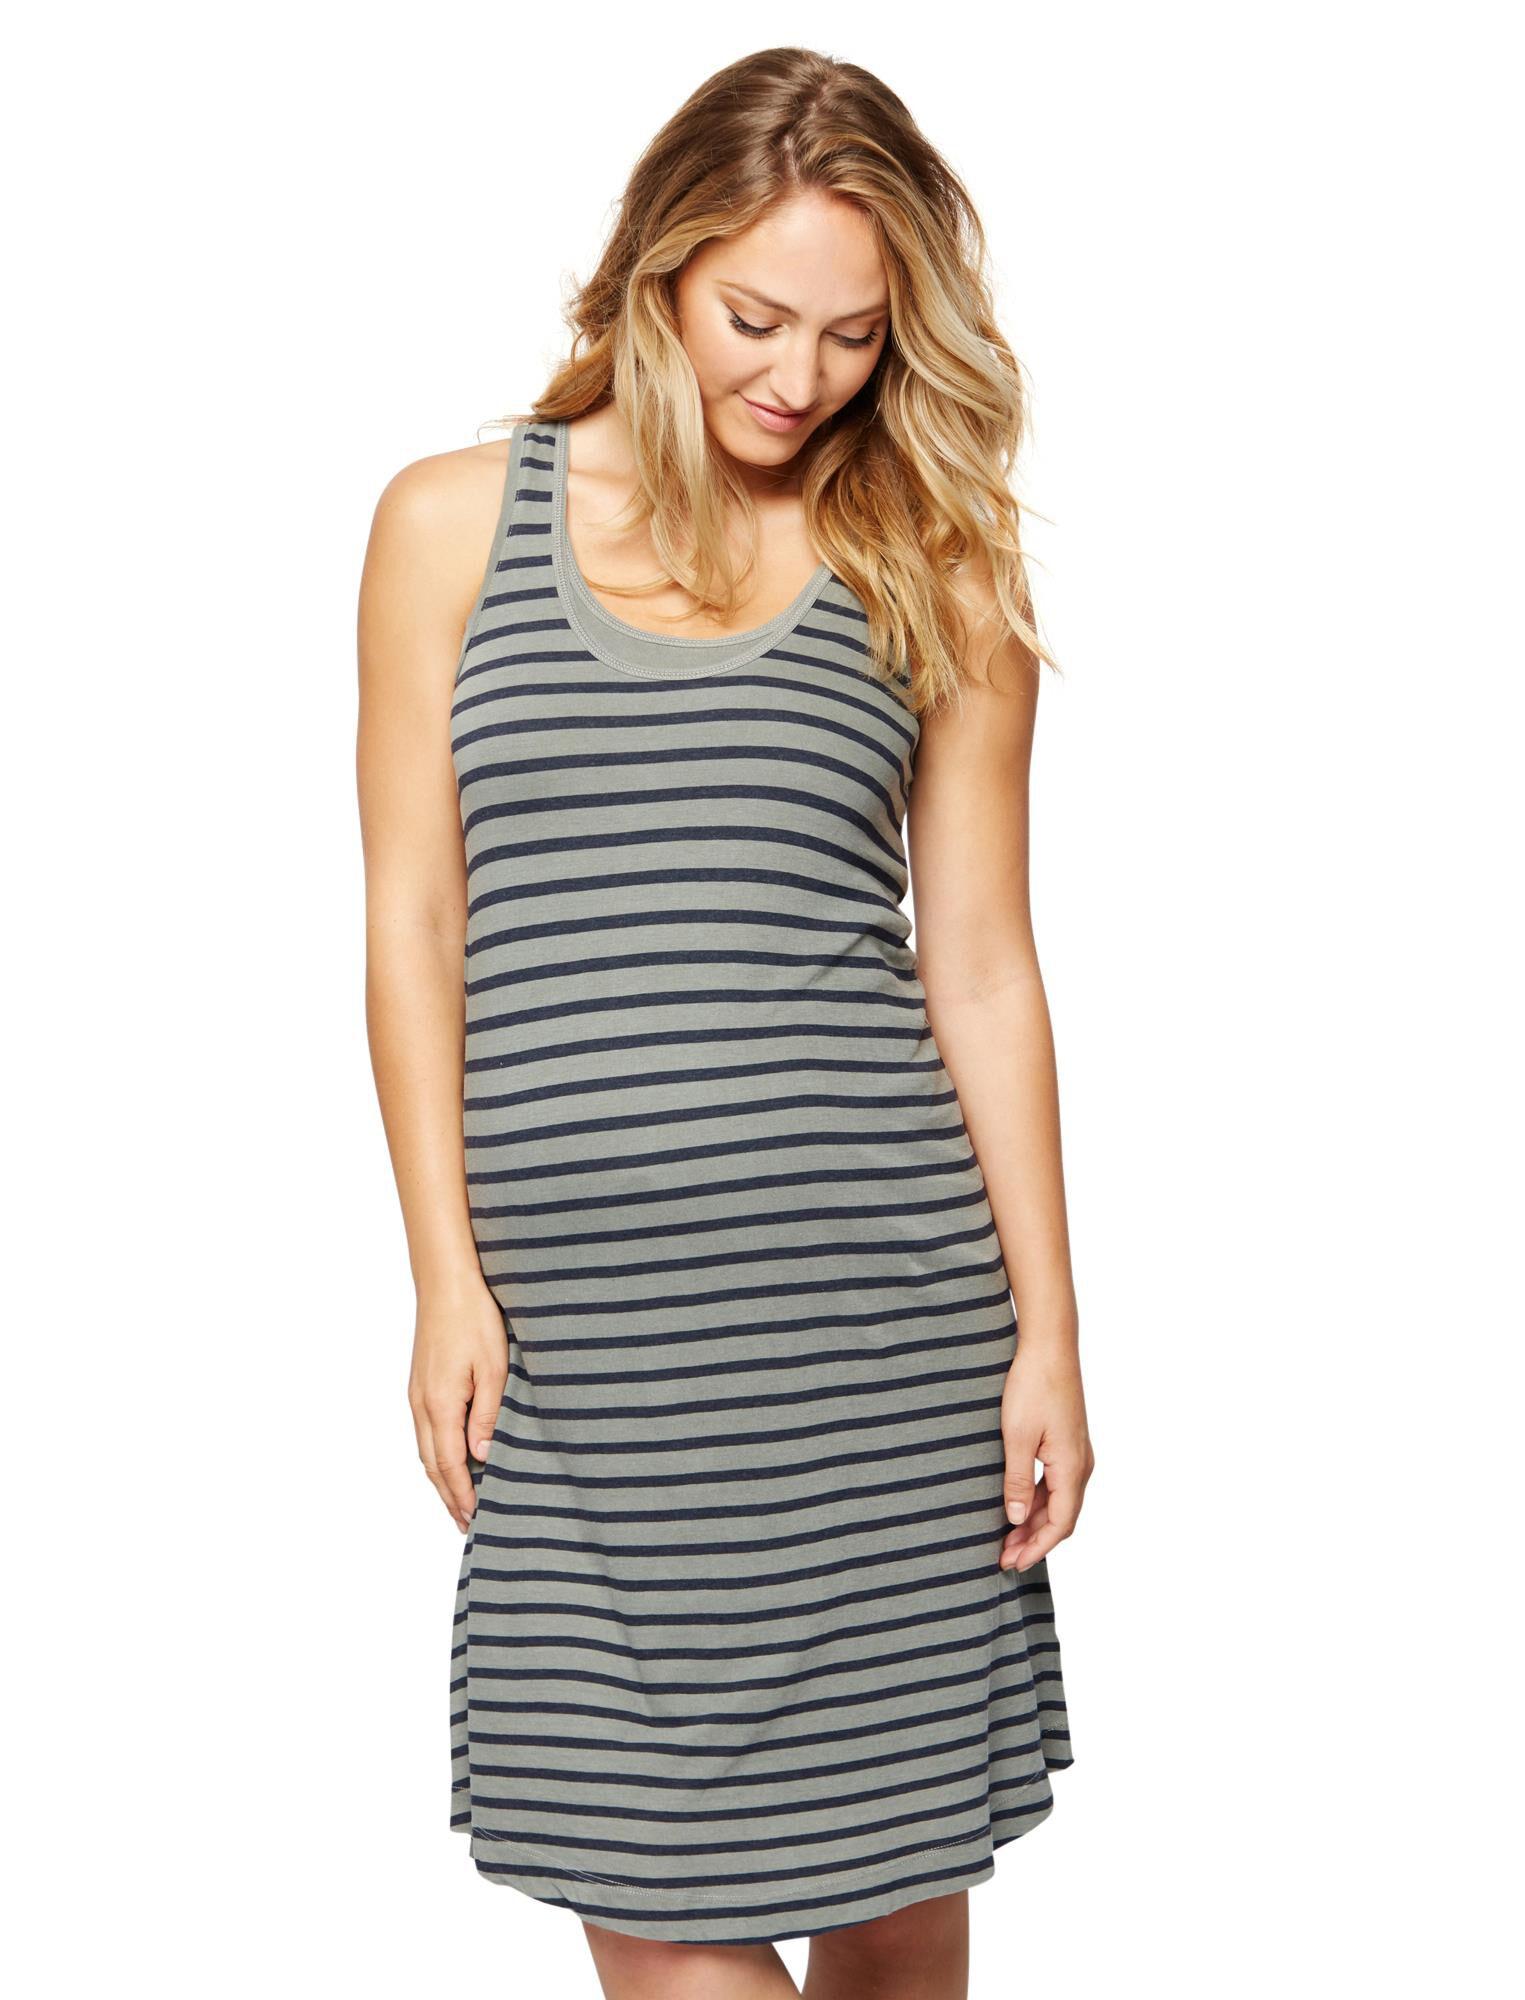 Splendid Tank Scoop Neck Maternity Dress